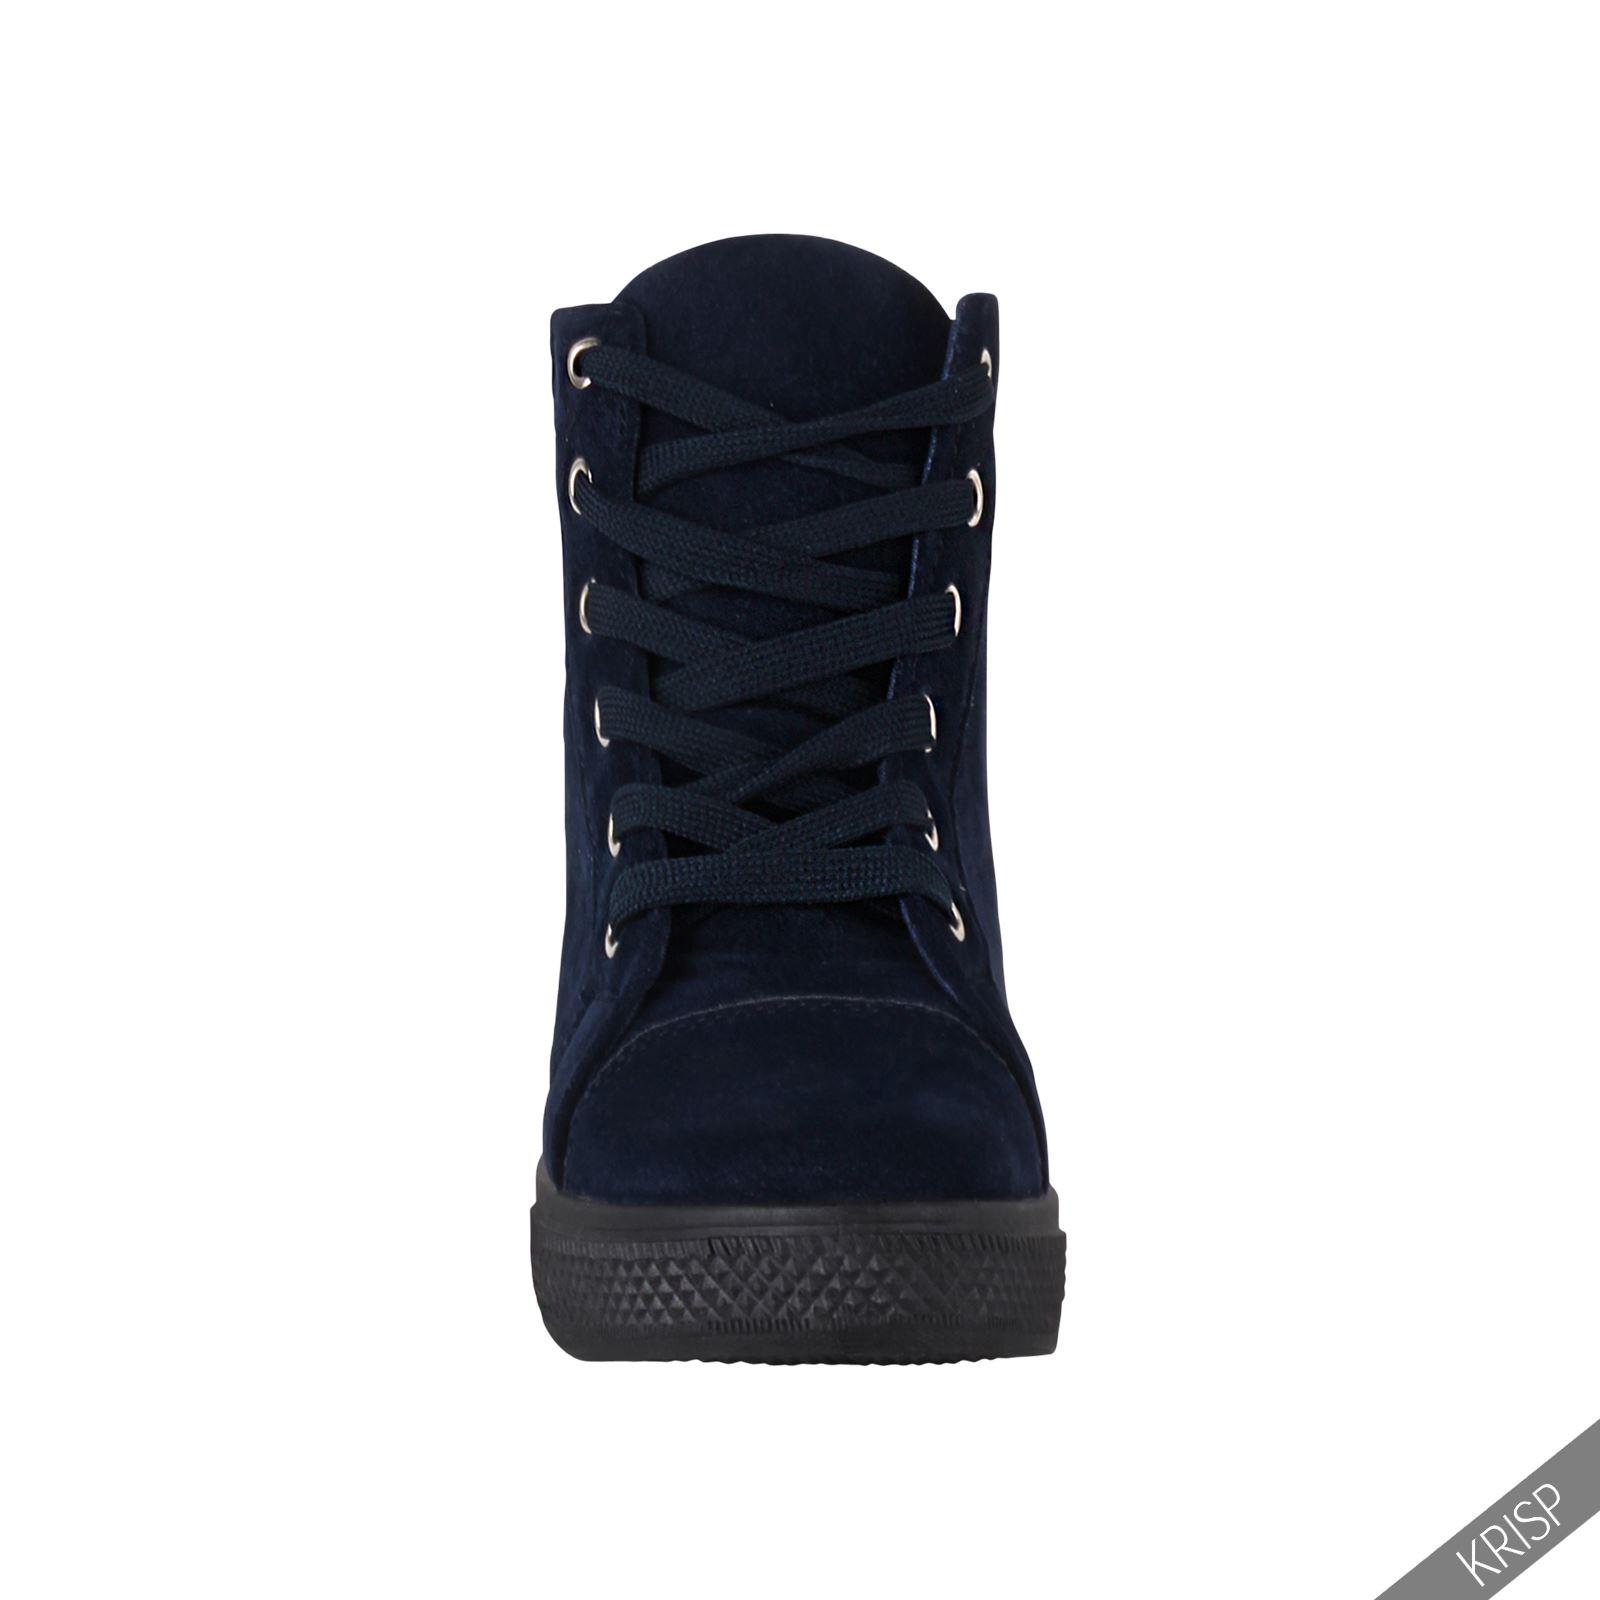 Botines dise o tac n cu a interior zapatillas depotivas for Botines con cuna interior